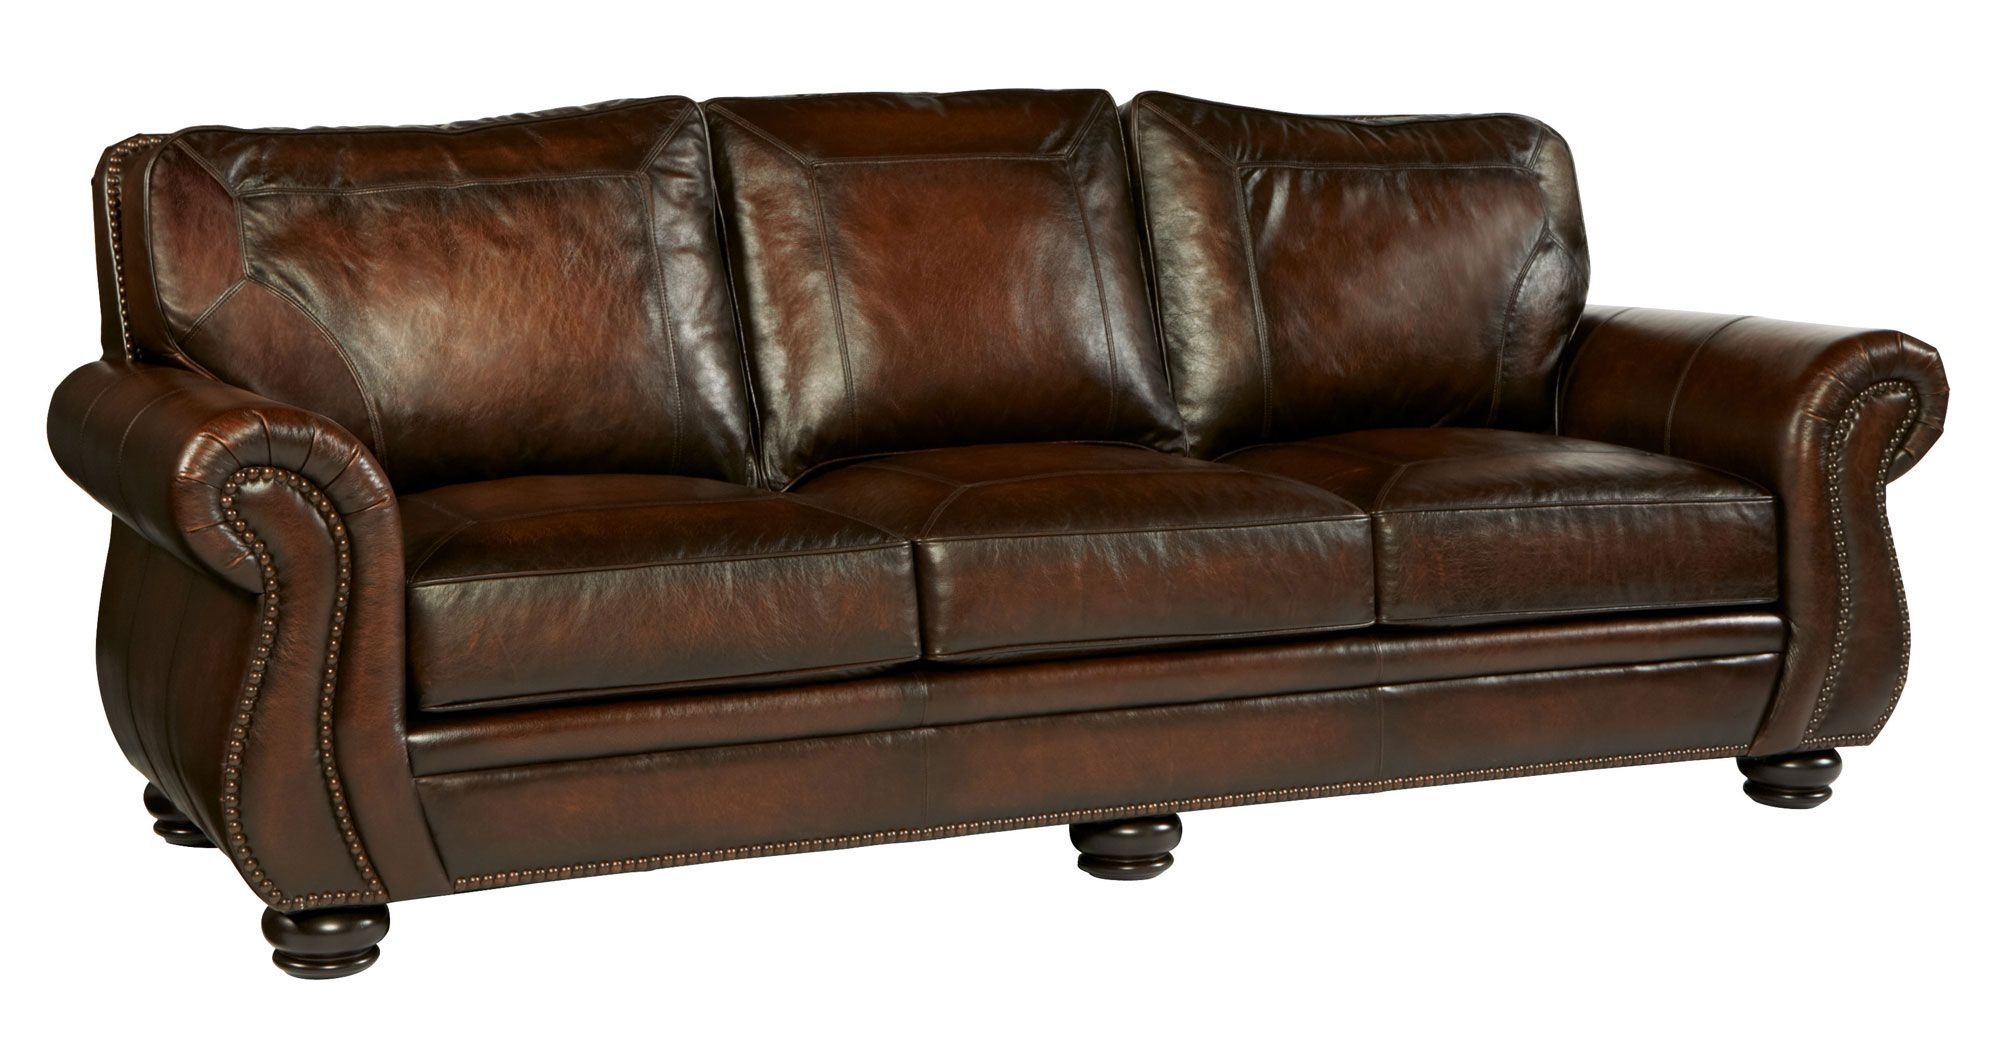 Sofa | Bernhardt|Item: 6957L Leather Shown: 165 220